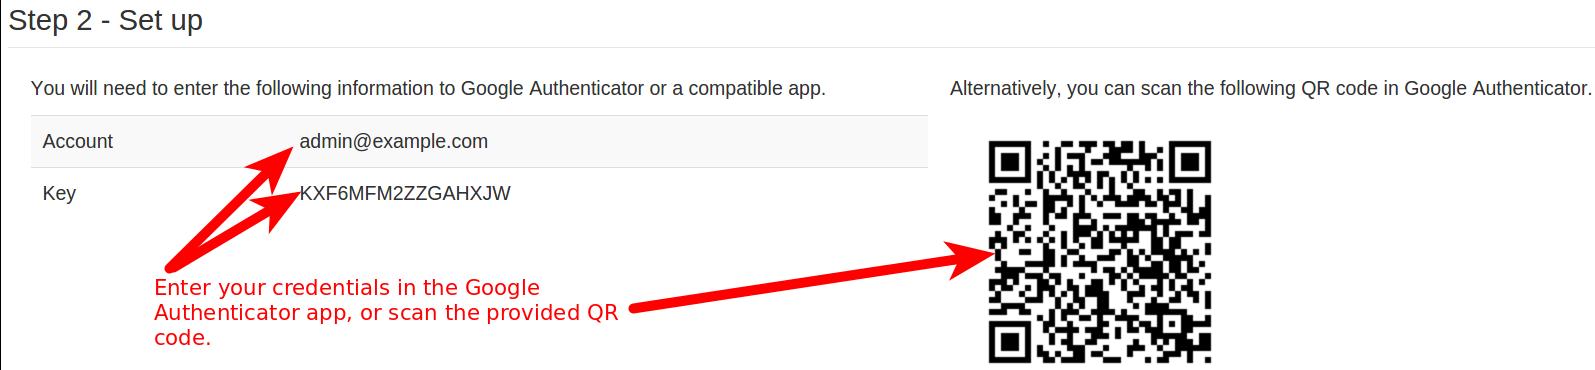 Google Two-Factor Authentication setup